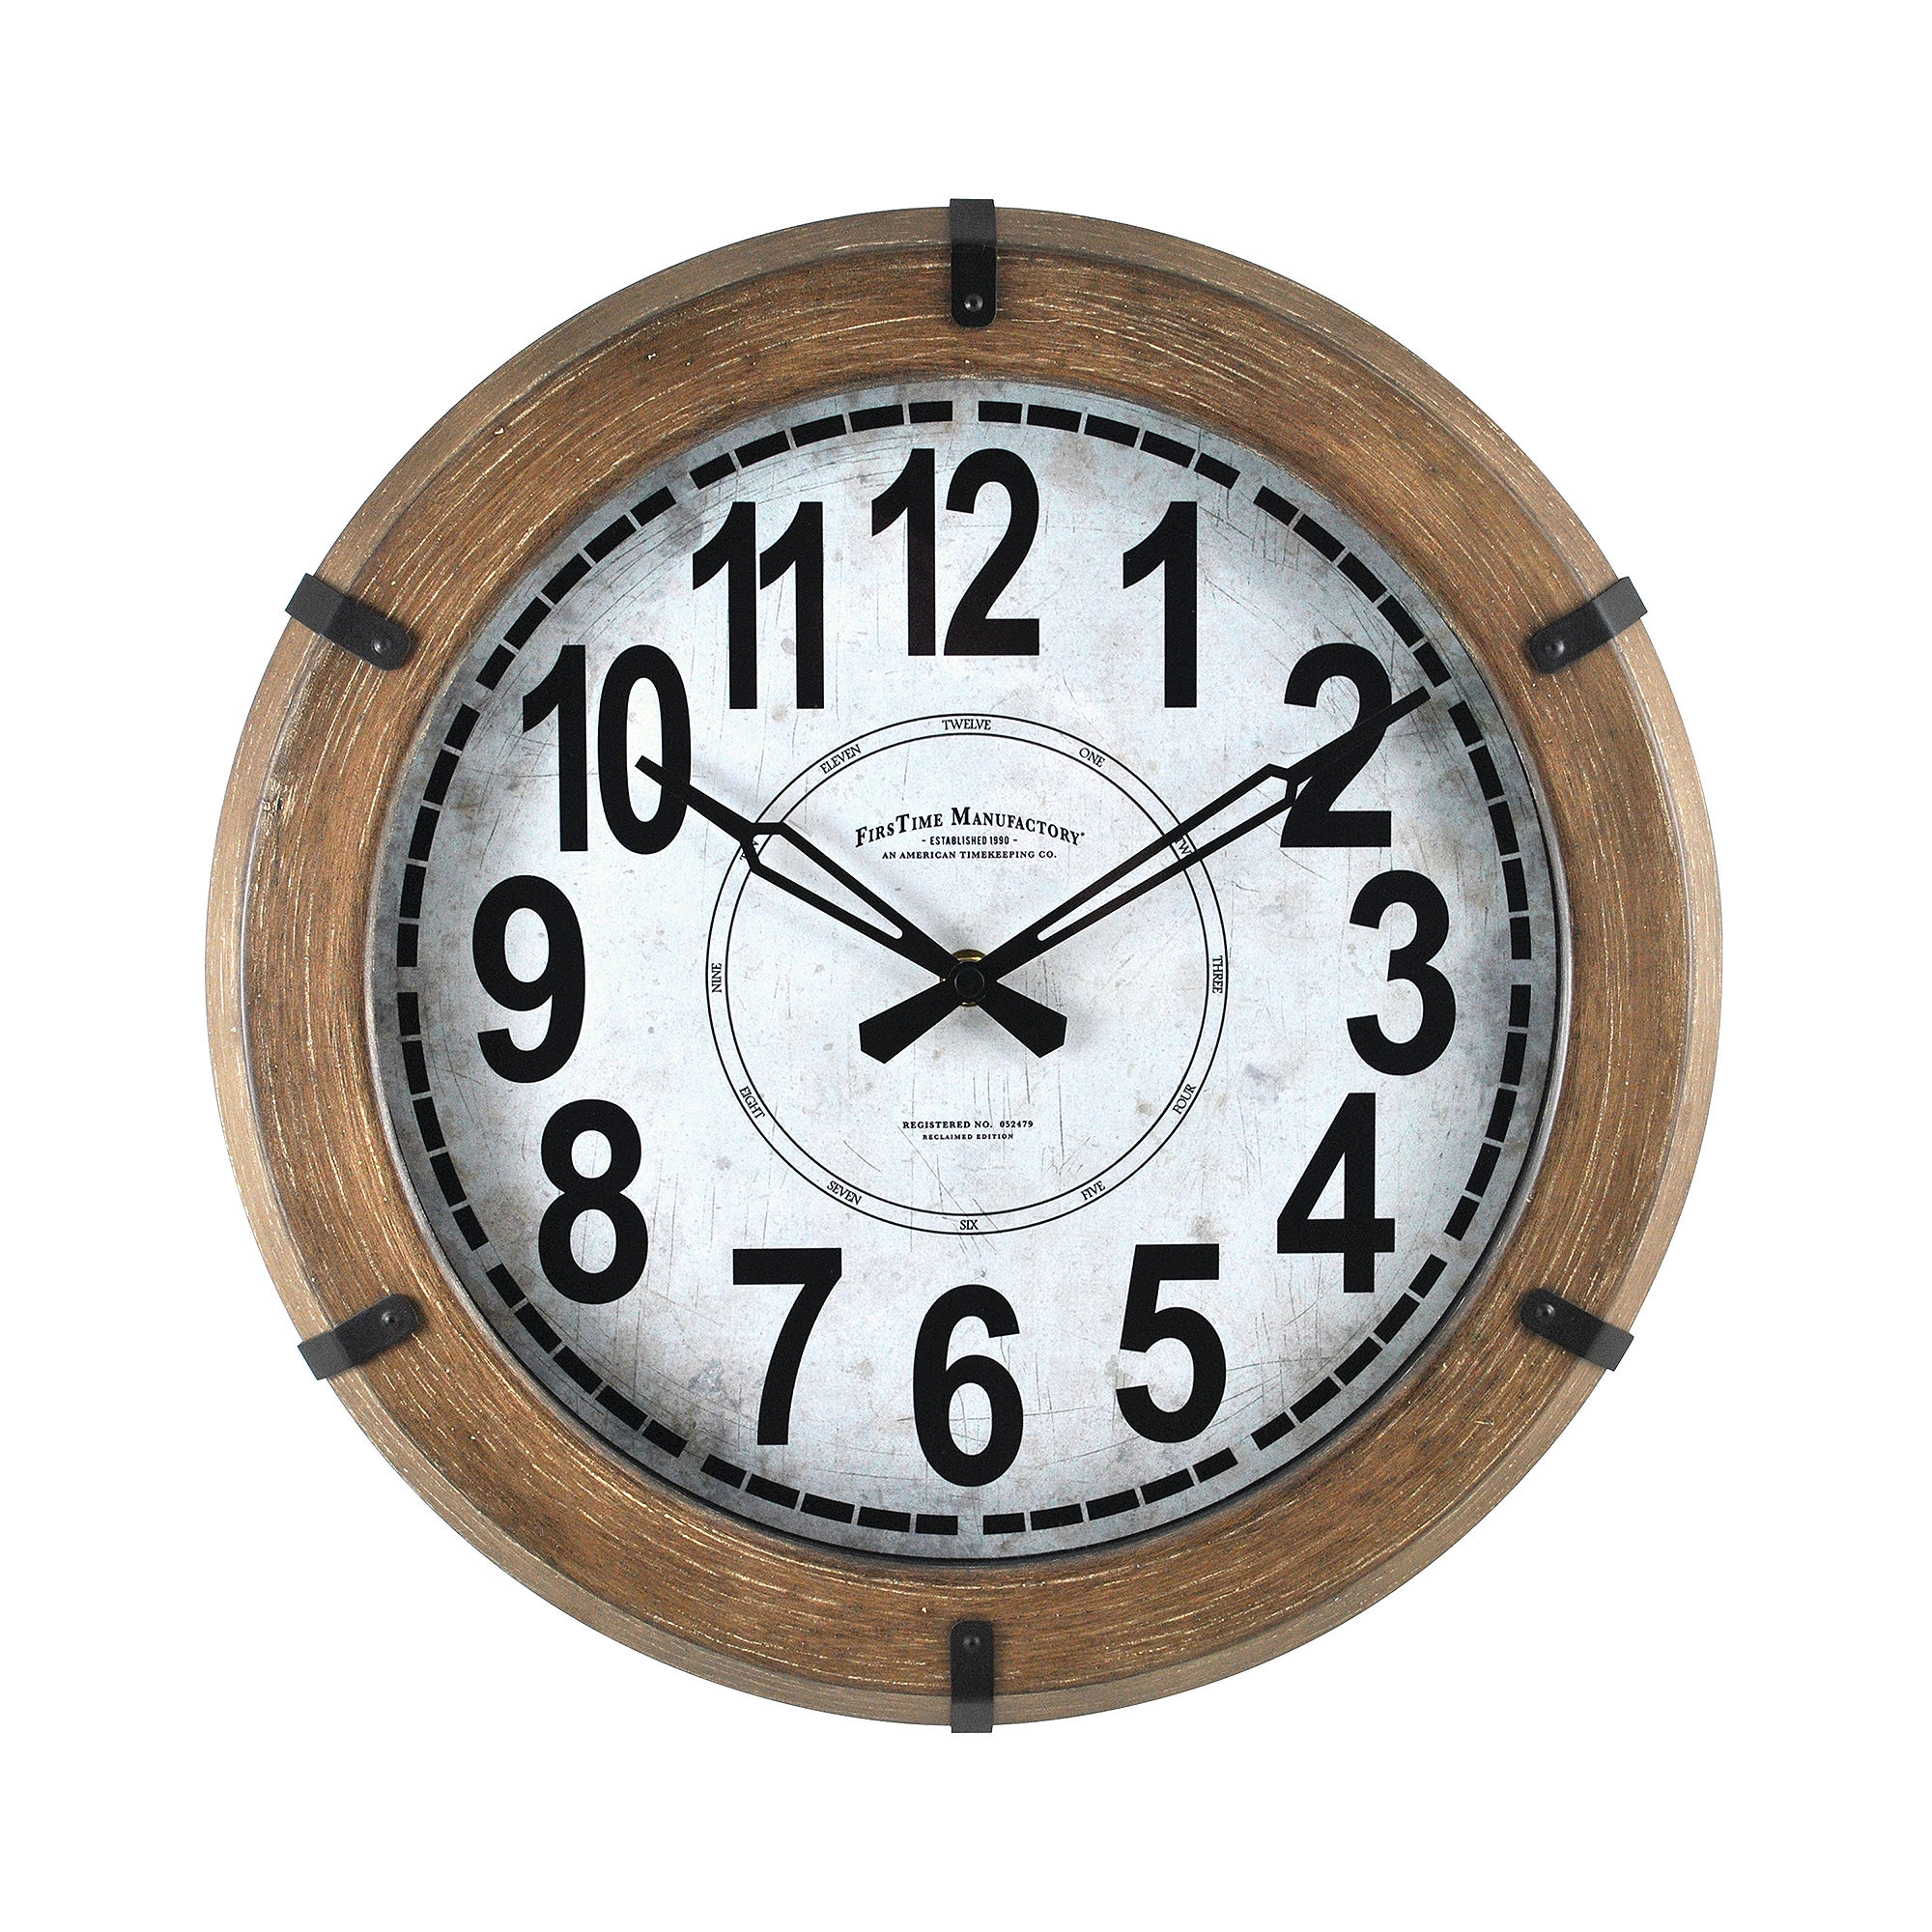 firstime modern rustic wall clock